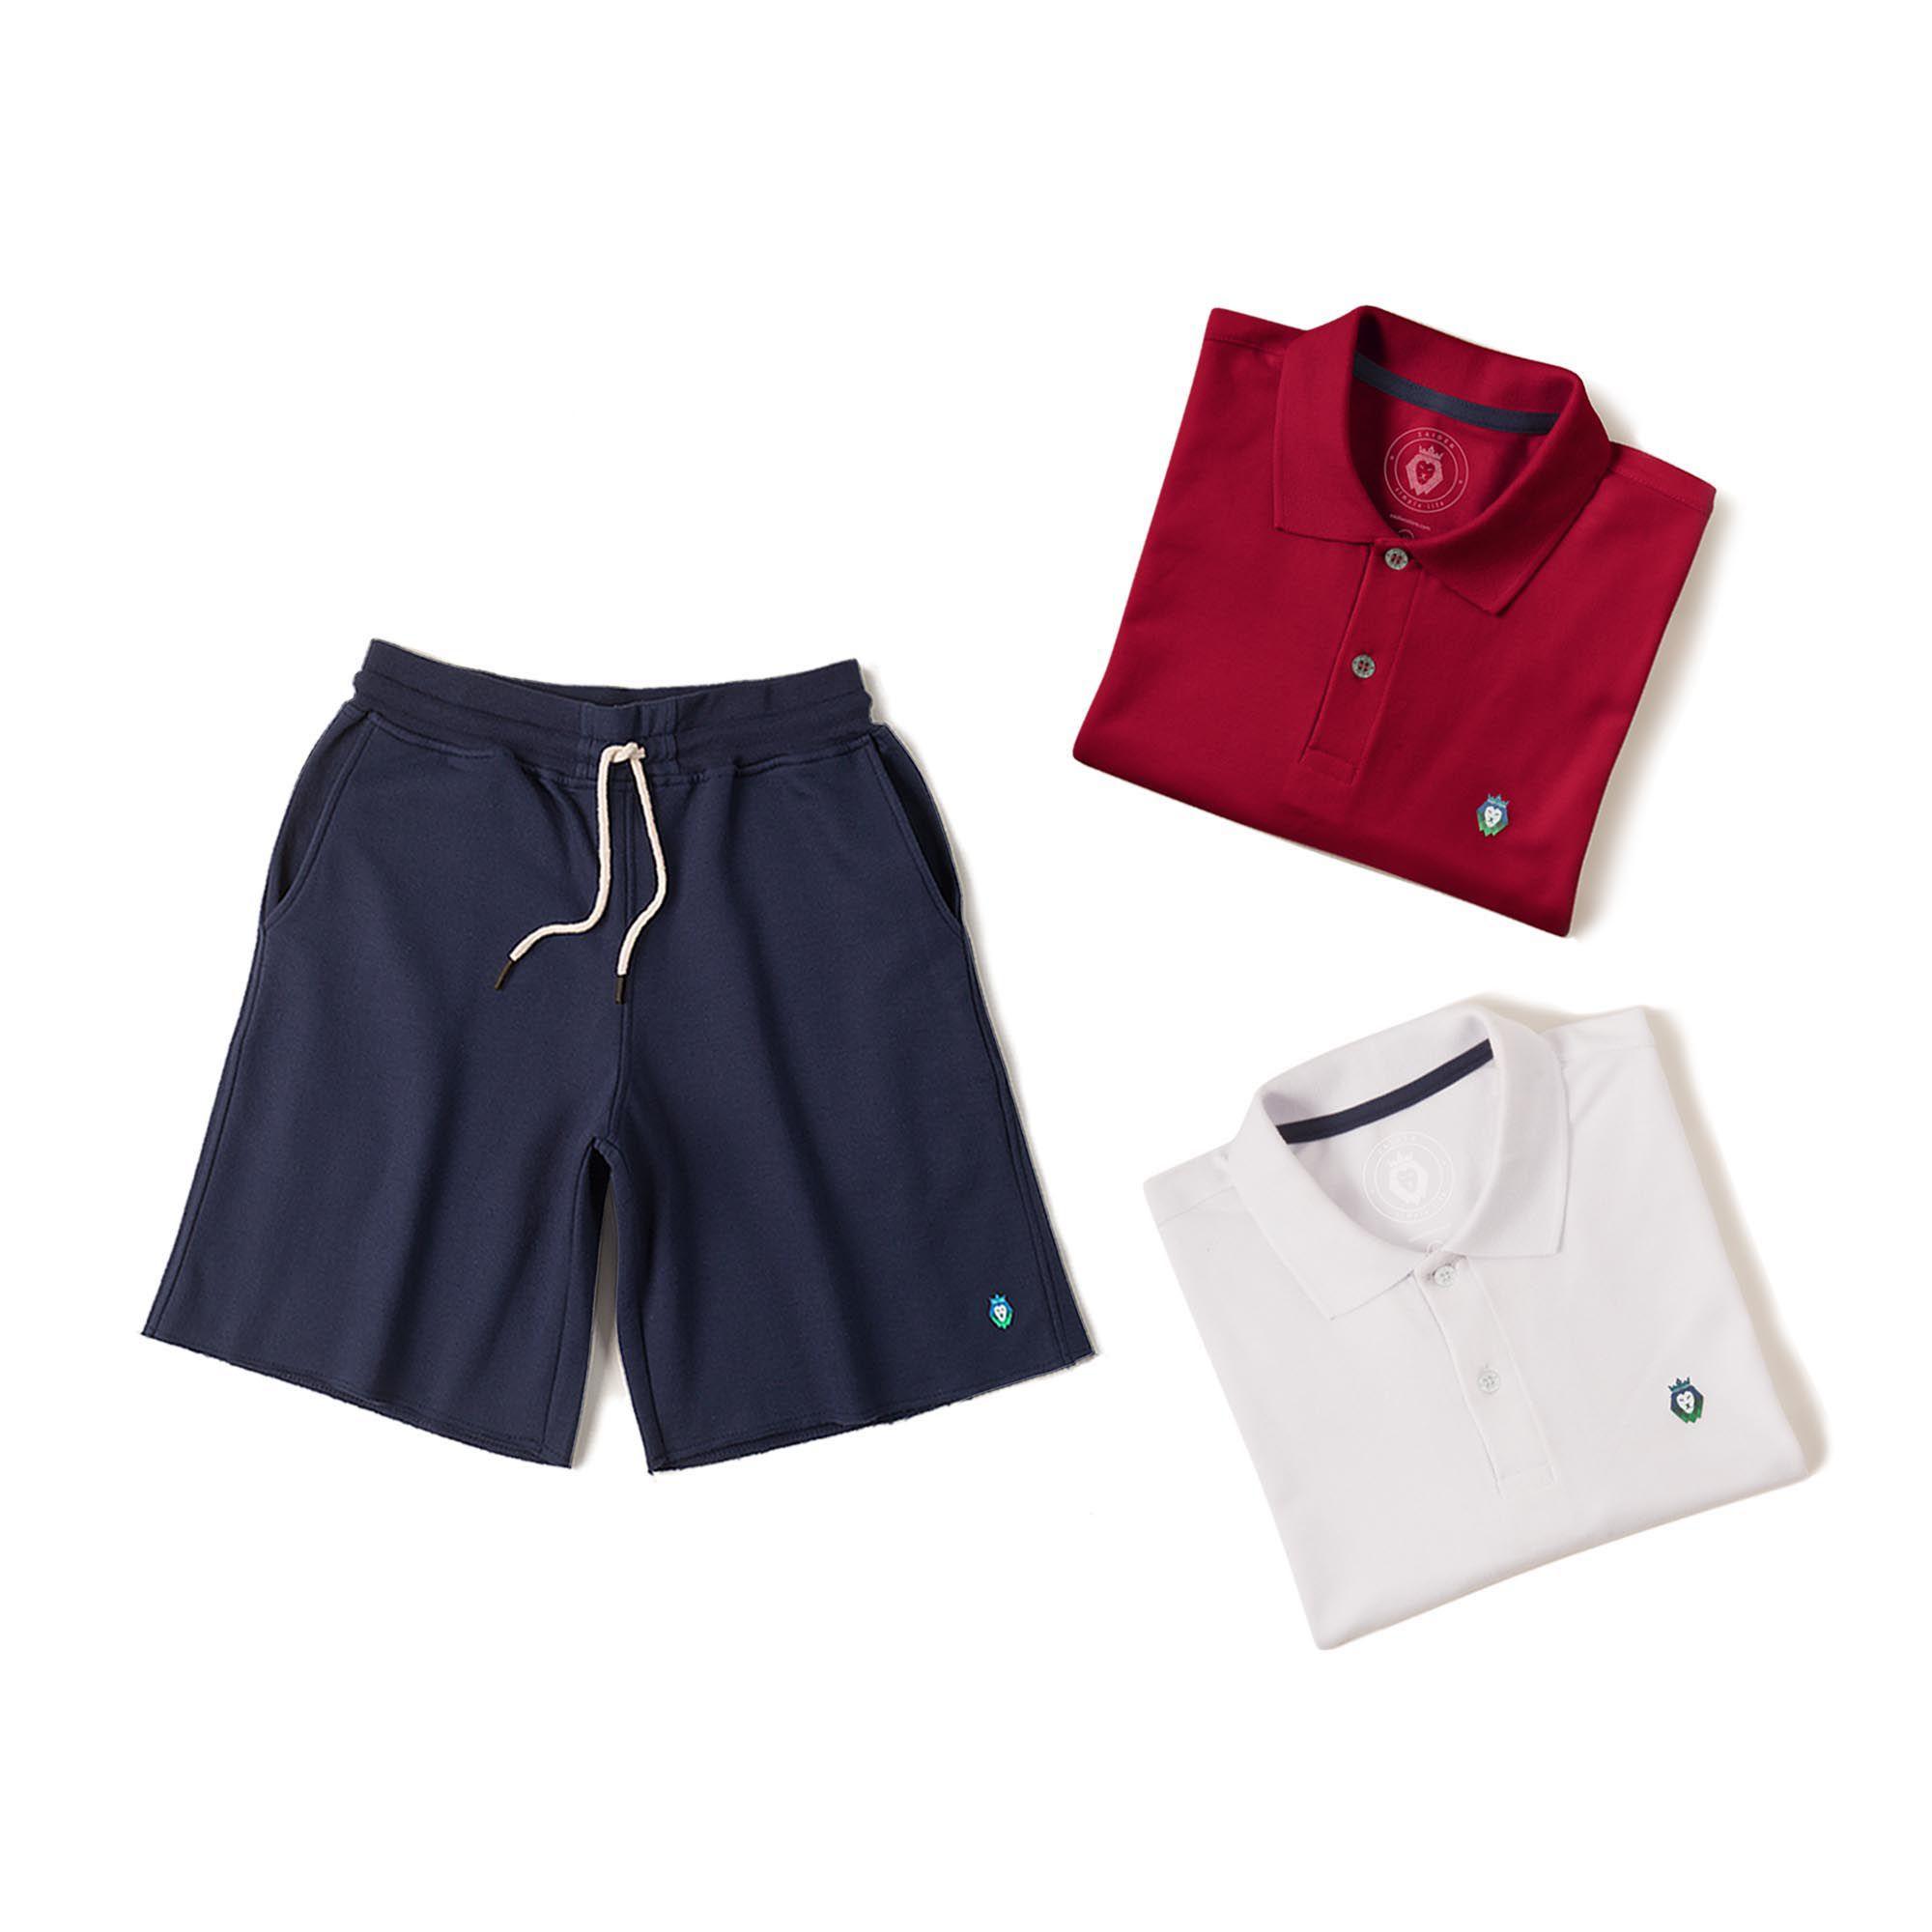 Kit 1 Bermuda Basic Azul Marinho + 2 Camisas Polo Style Branca Bordô Zaiden Masculina